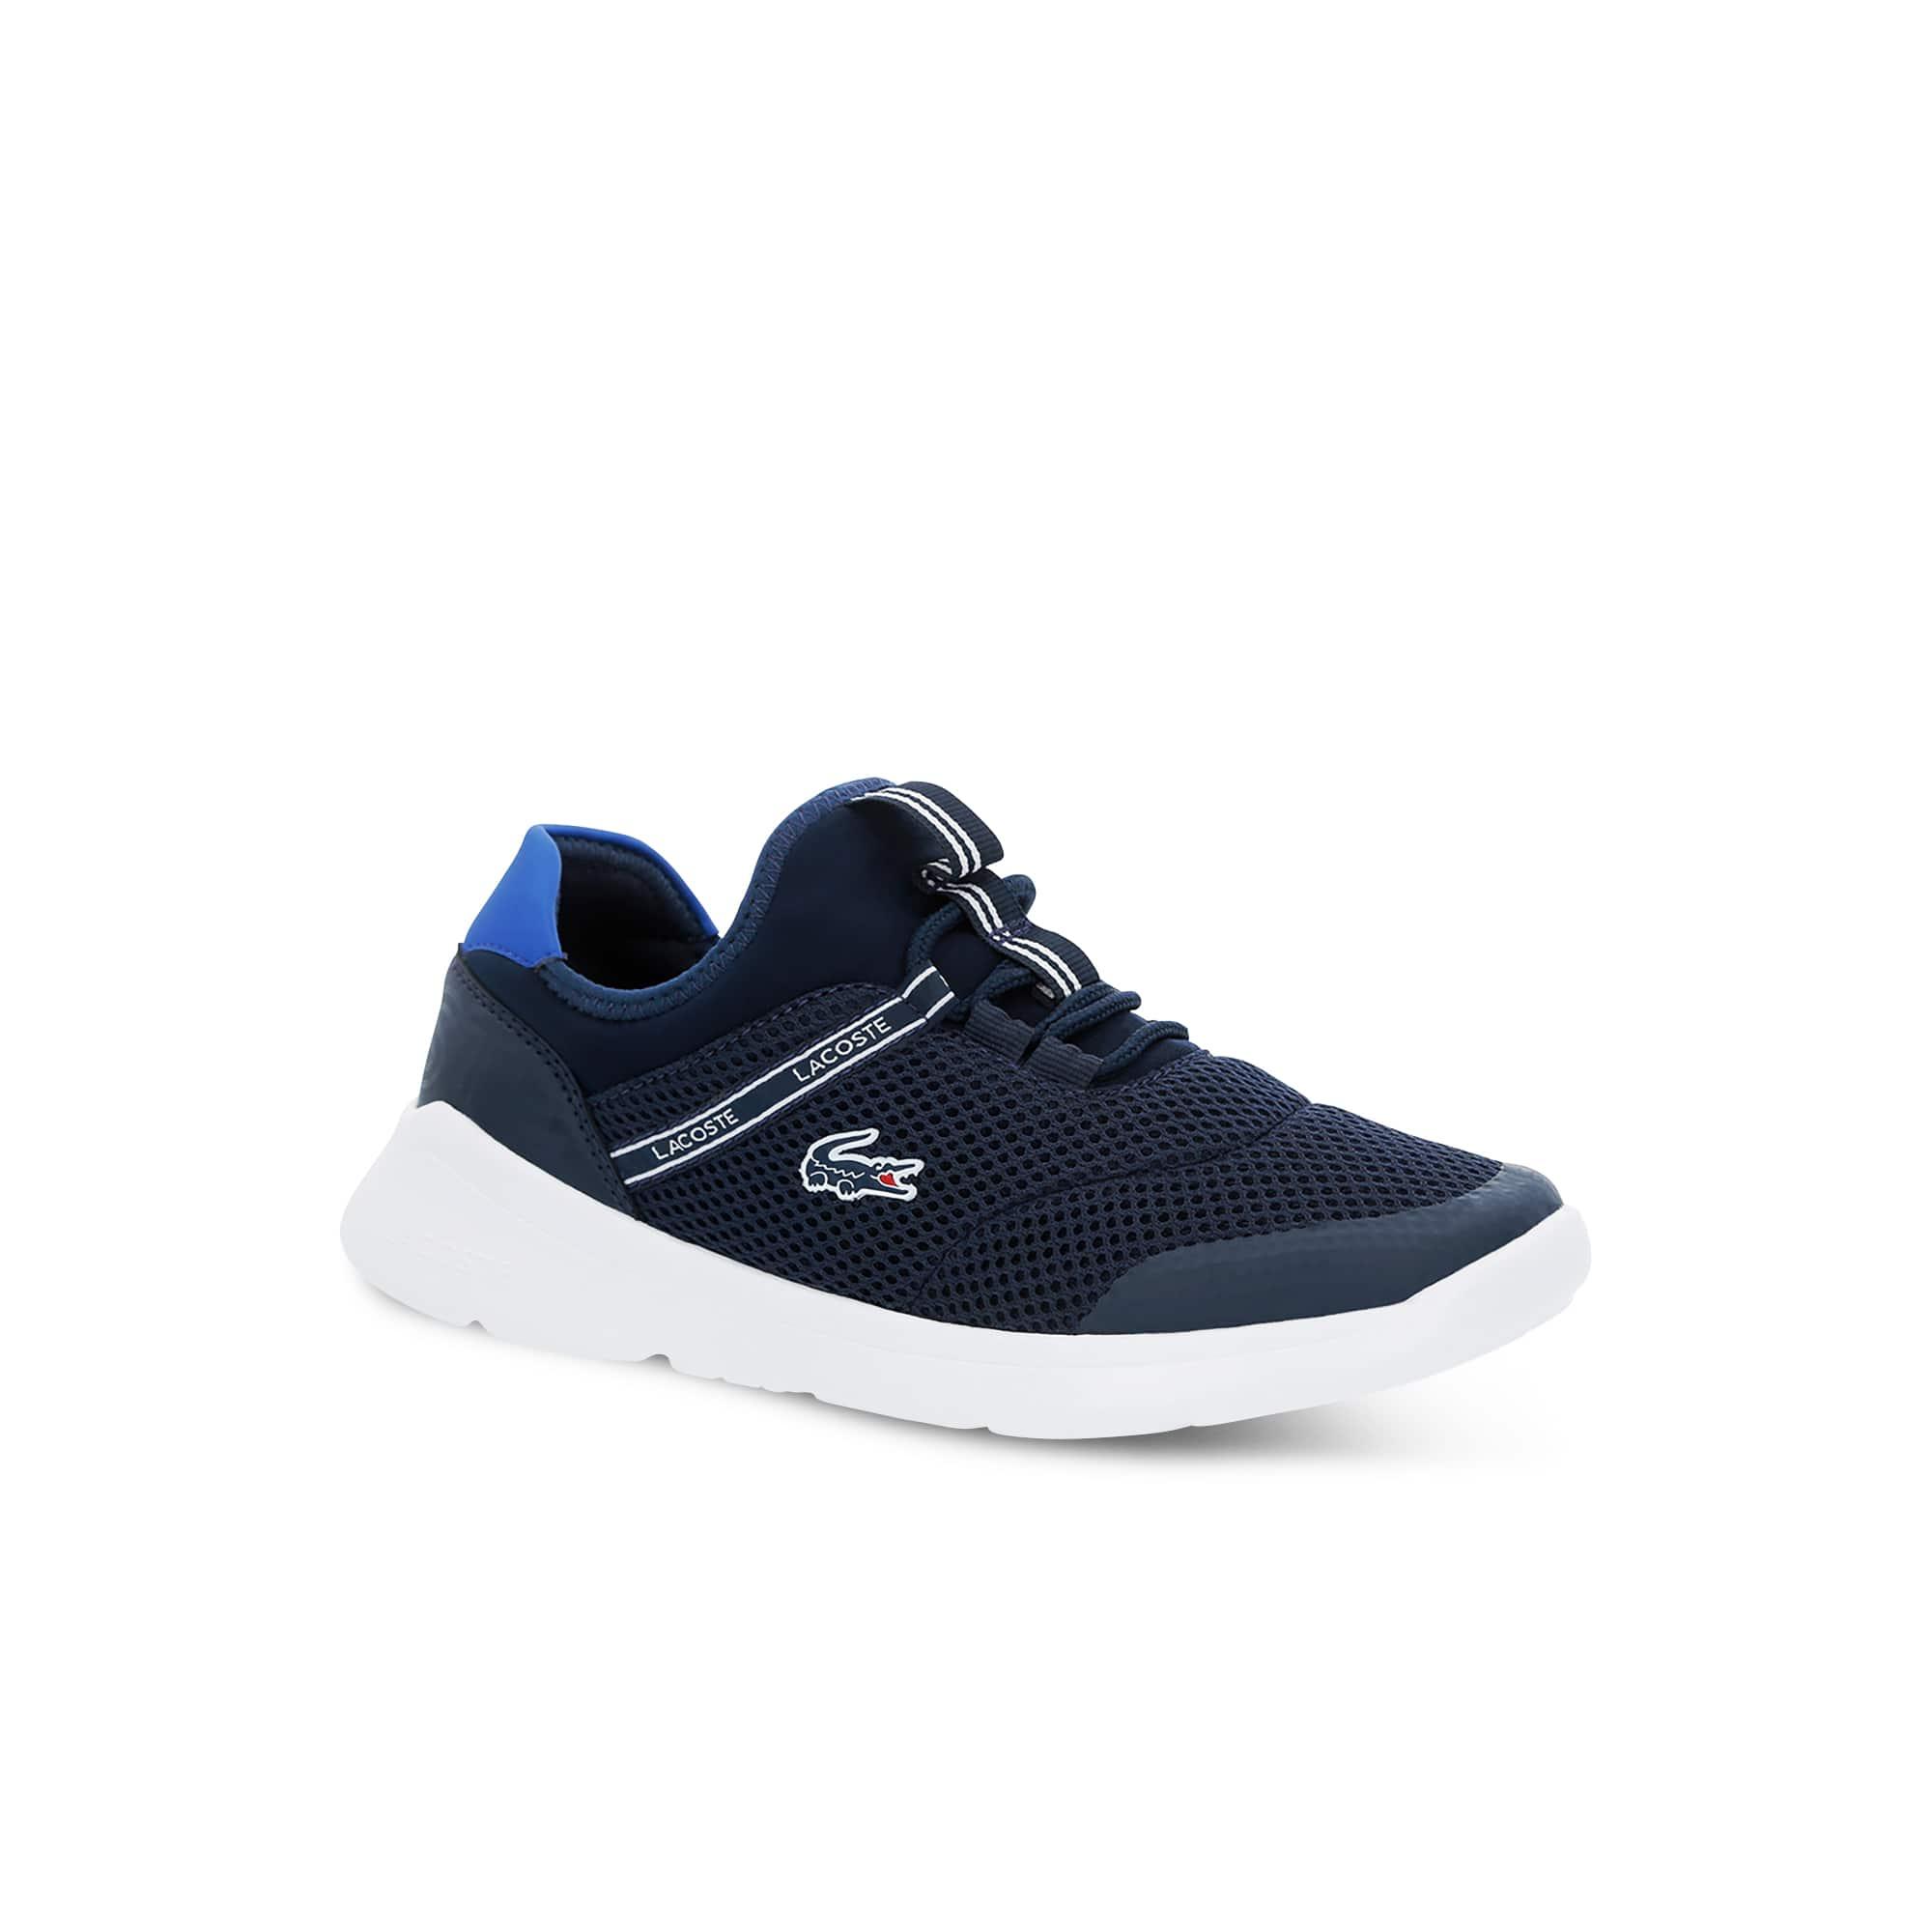 ae51636700944 أحذية LACOSTE - تسوق جميع أحذية LACOSTE عبر الإنترنت